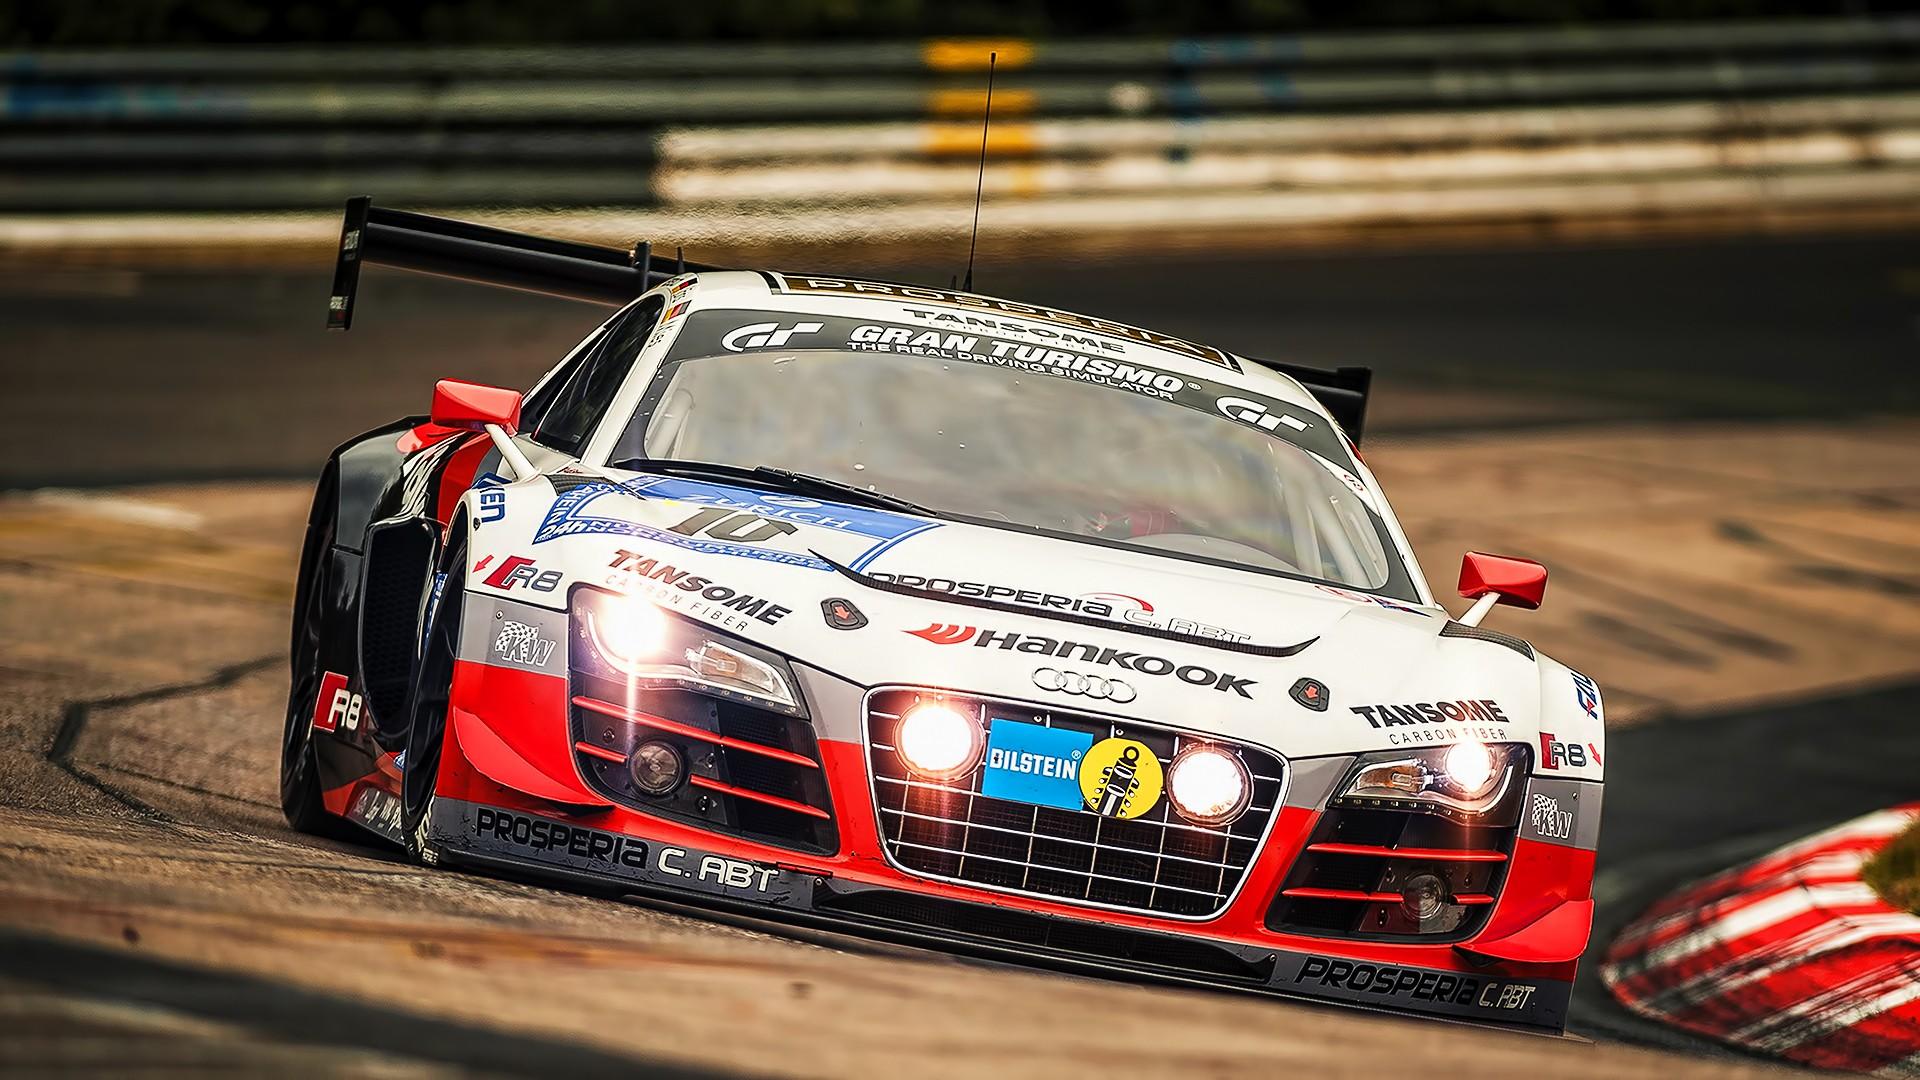 Audi R8 GT3 Racing Race Cars Wallpapers HD Desktop and Mobile 1920x1080